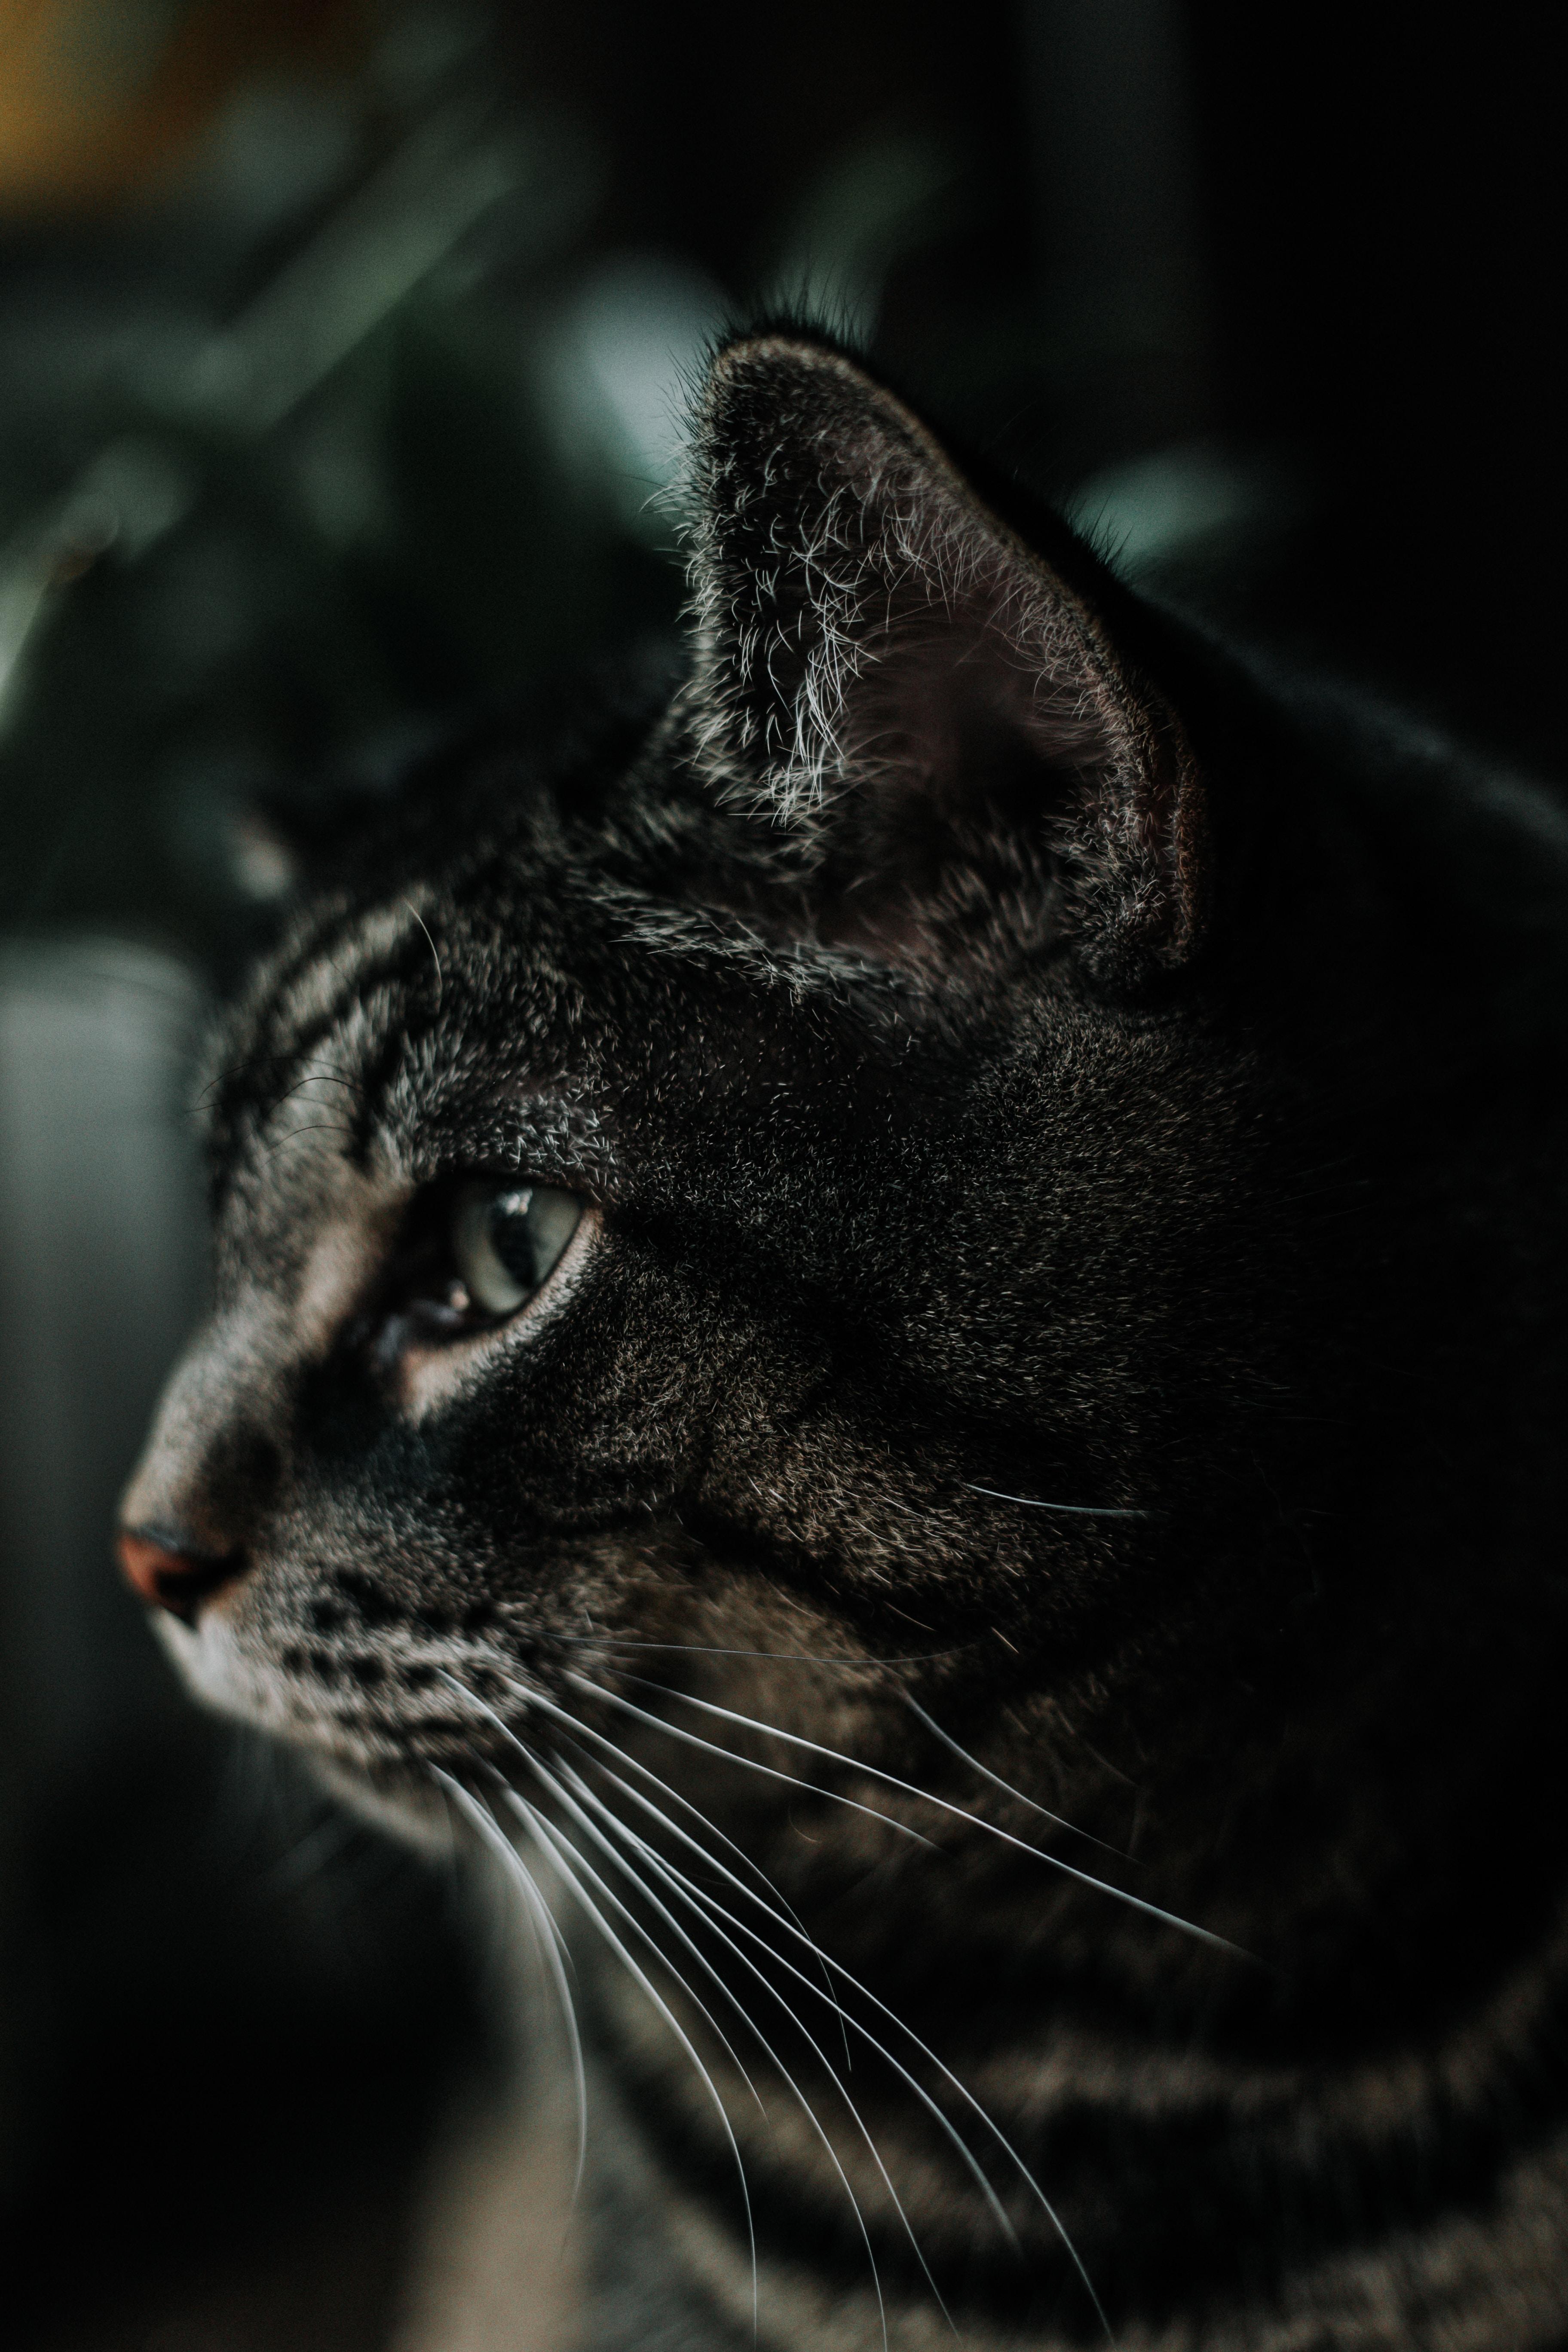 A dark grey tabby cat